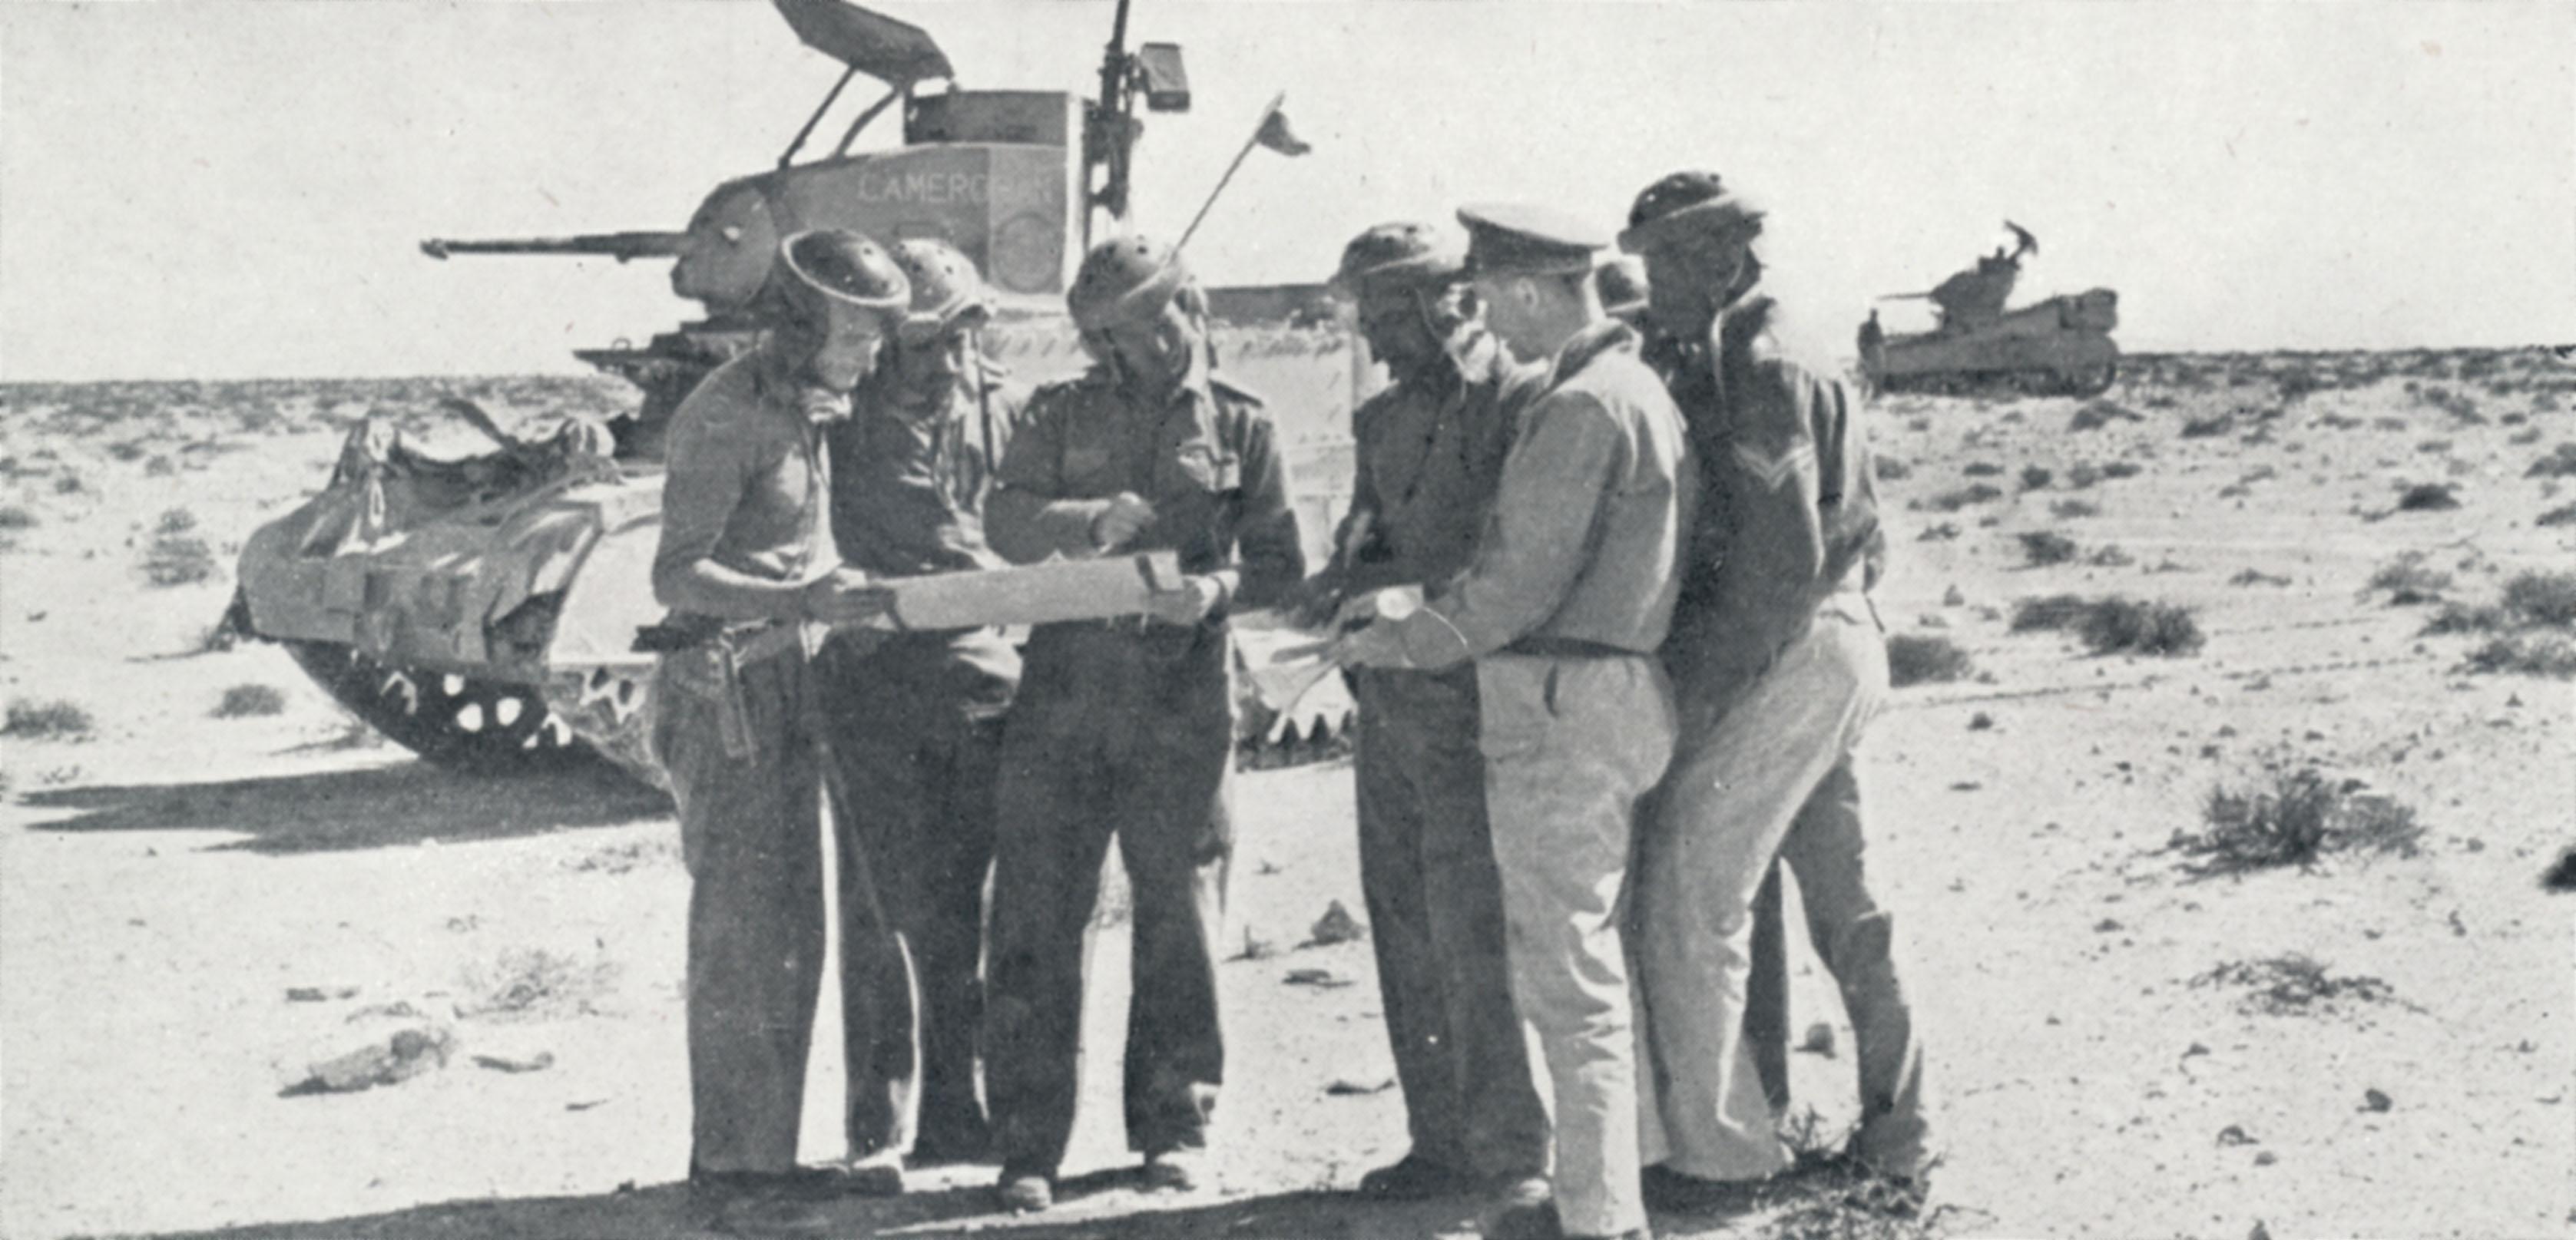 WW2 Army Personnel